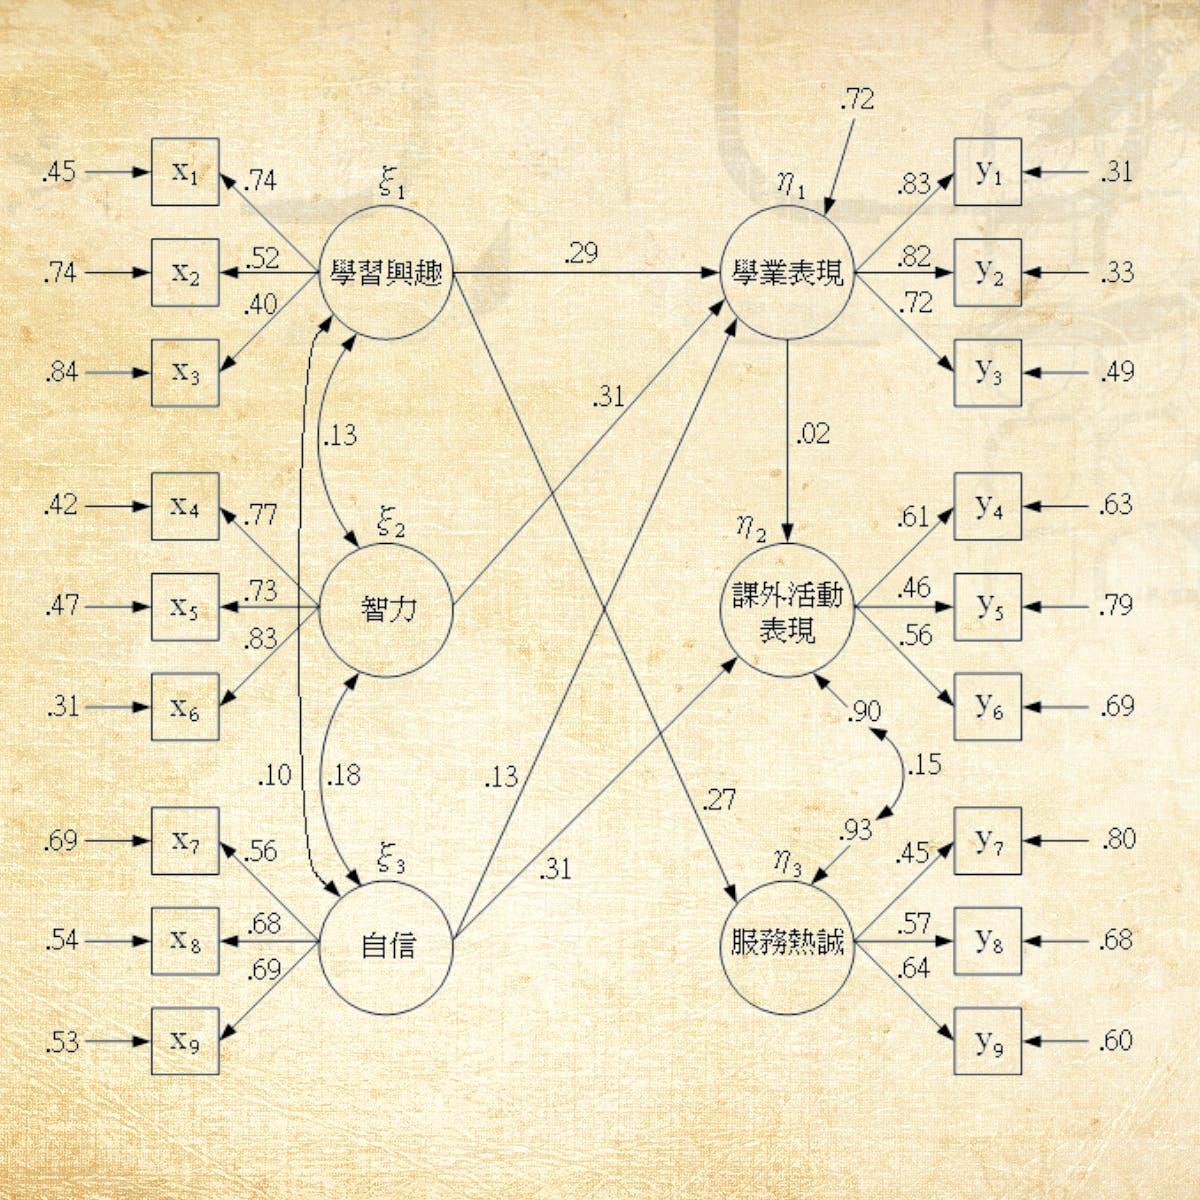 Structural Equation Model and its Applications | 结构方程模型及其应用 (粤语)